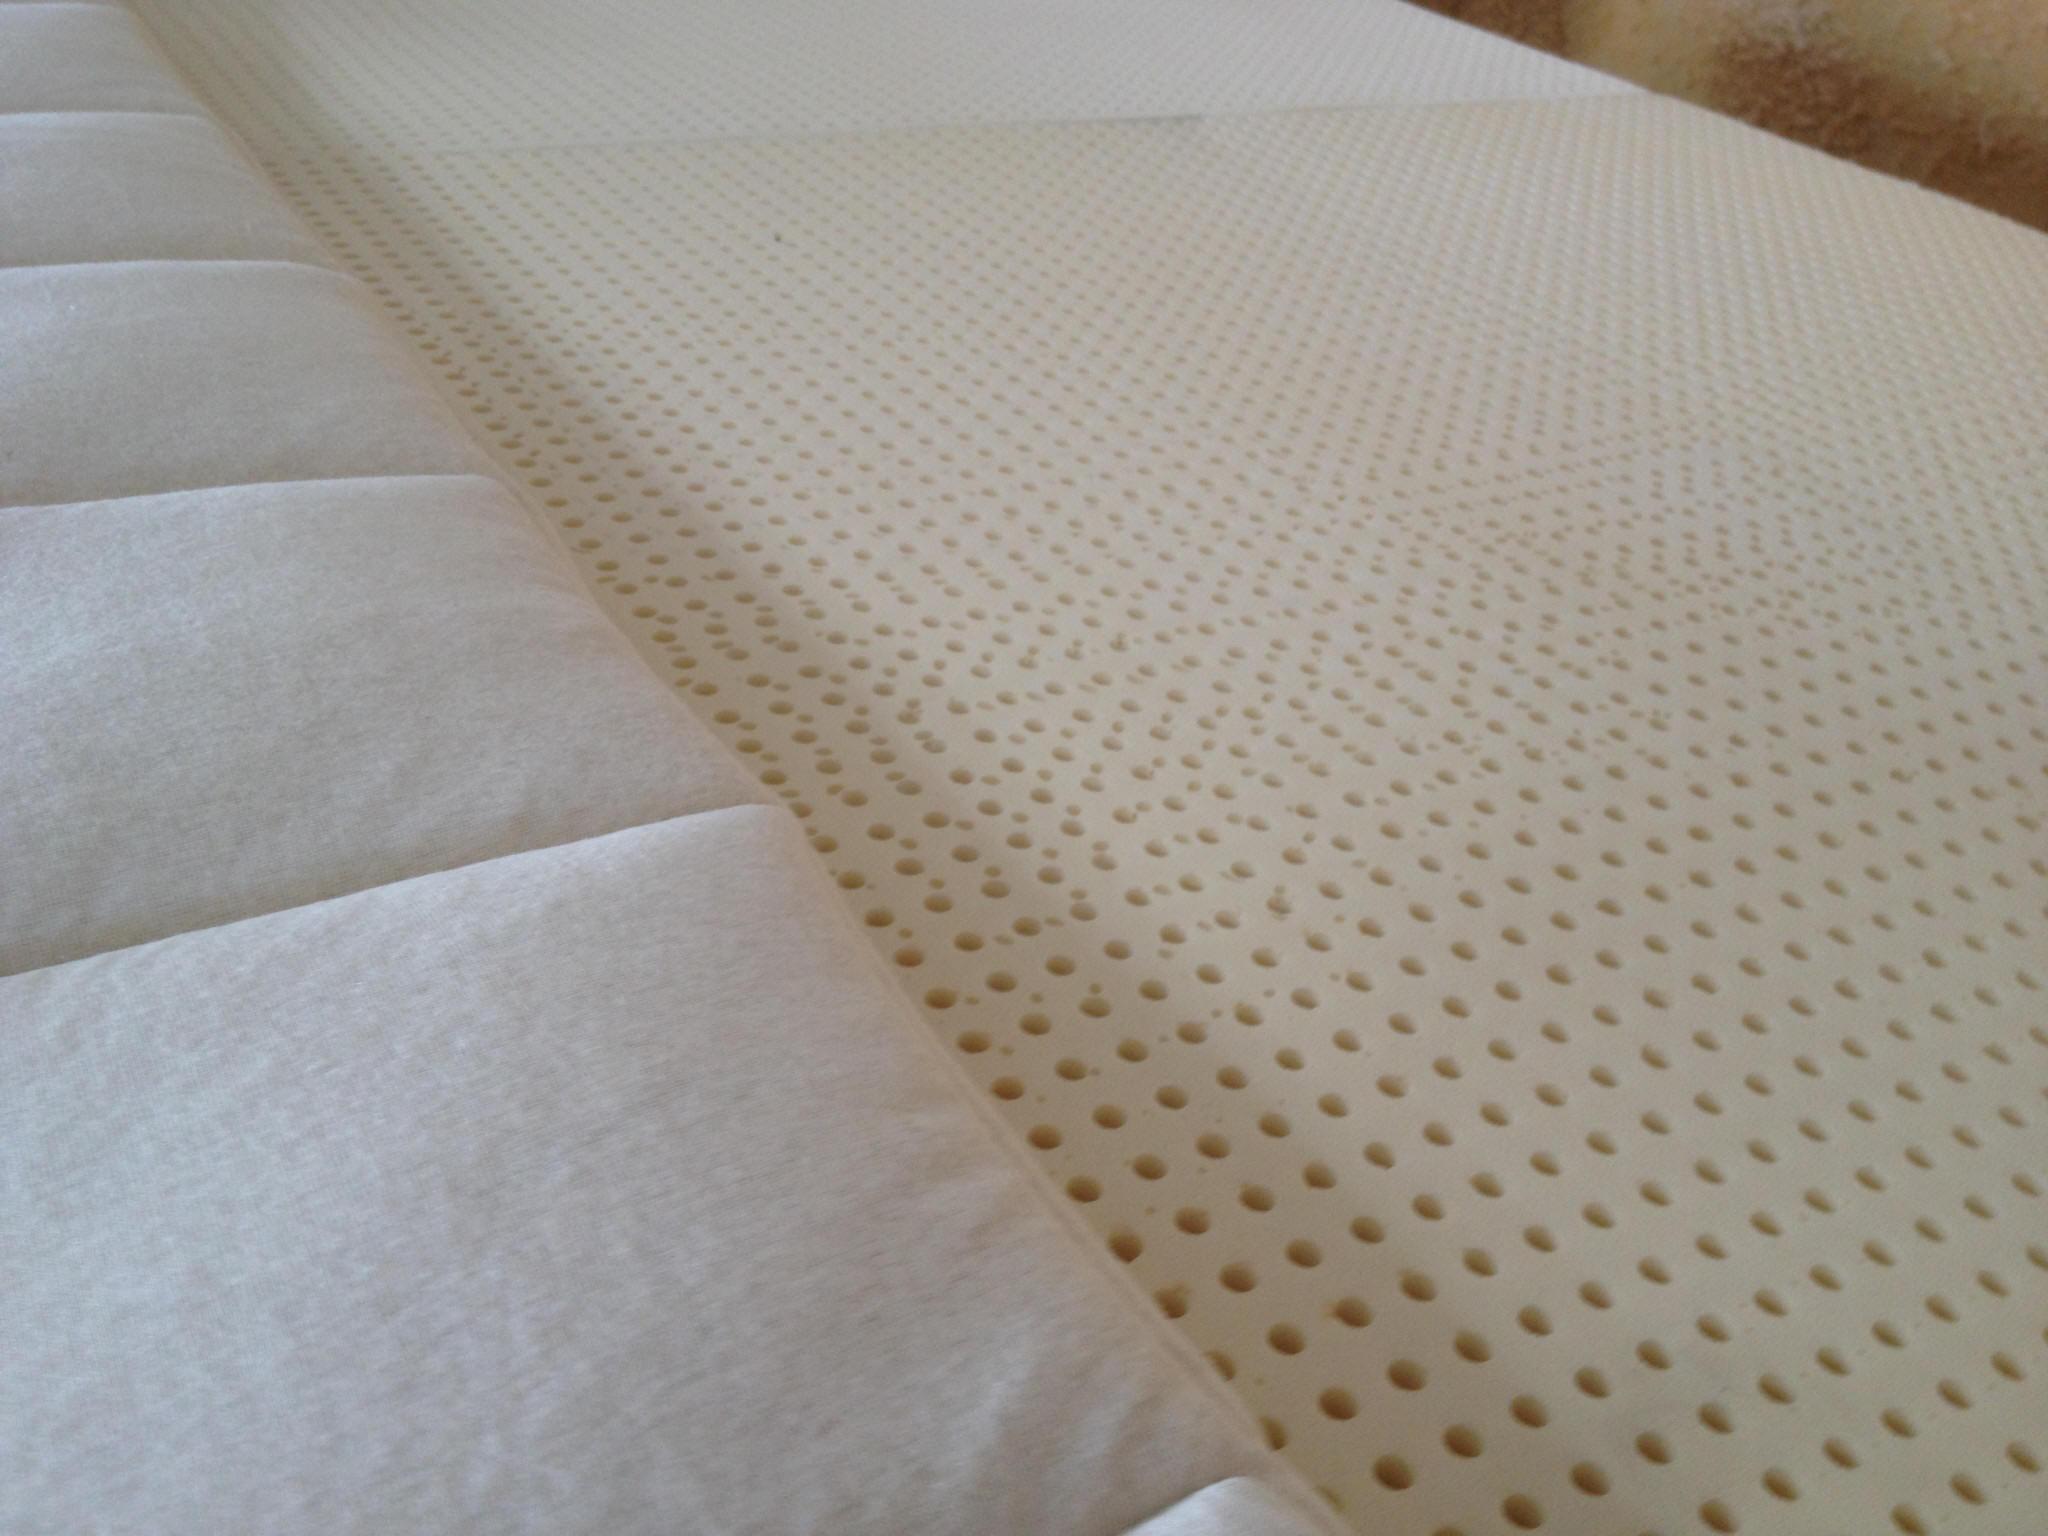 Cheapest Twin XL Restonic Comfort Care Select Cameron Firm Mattress Set